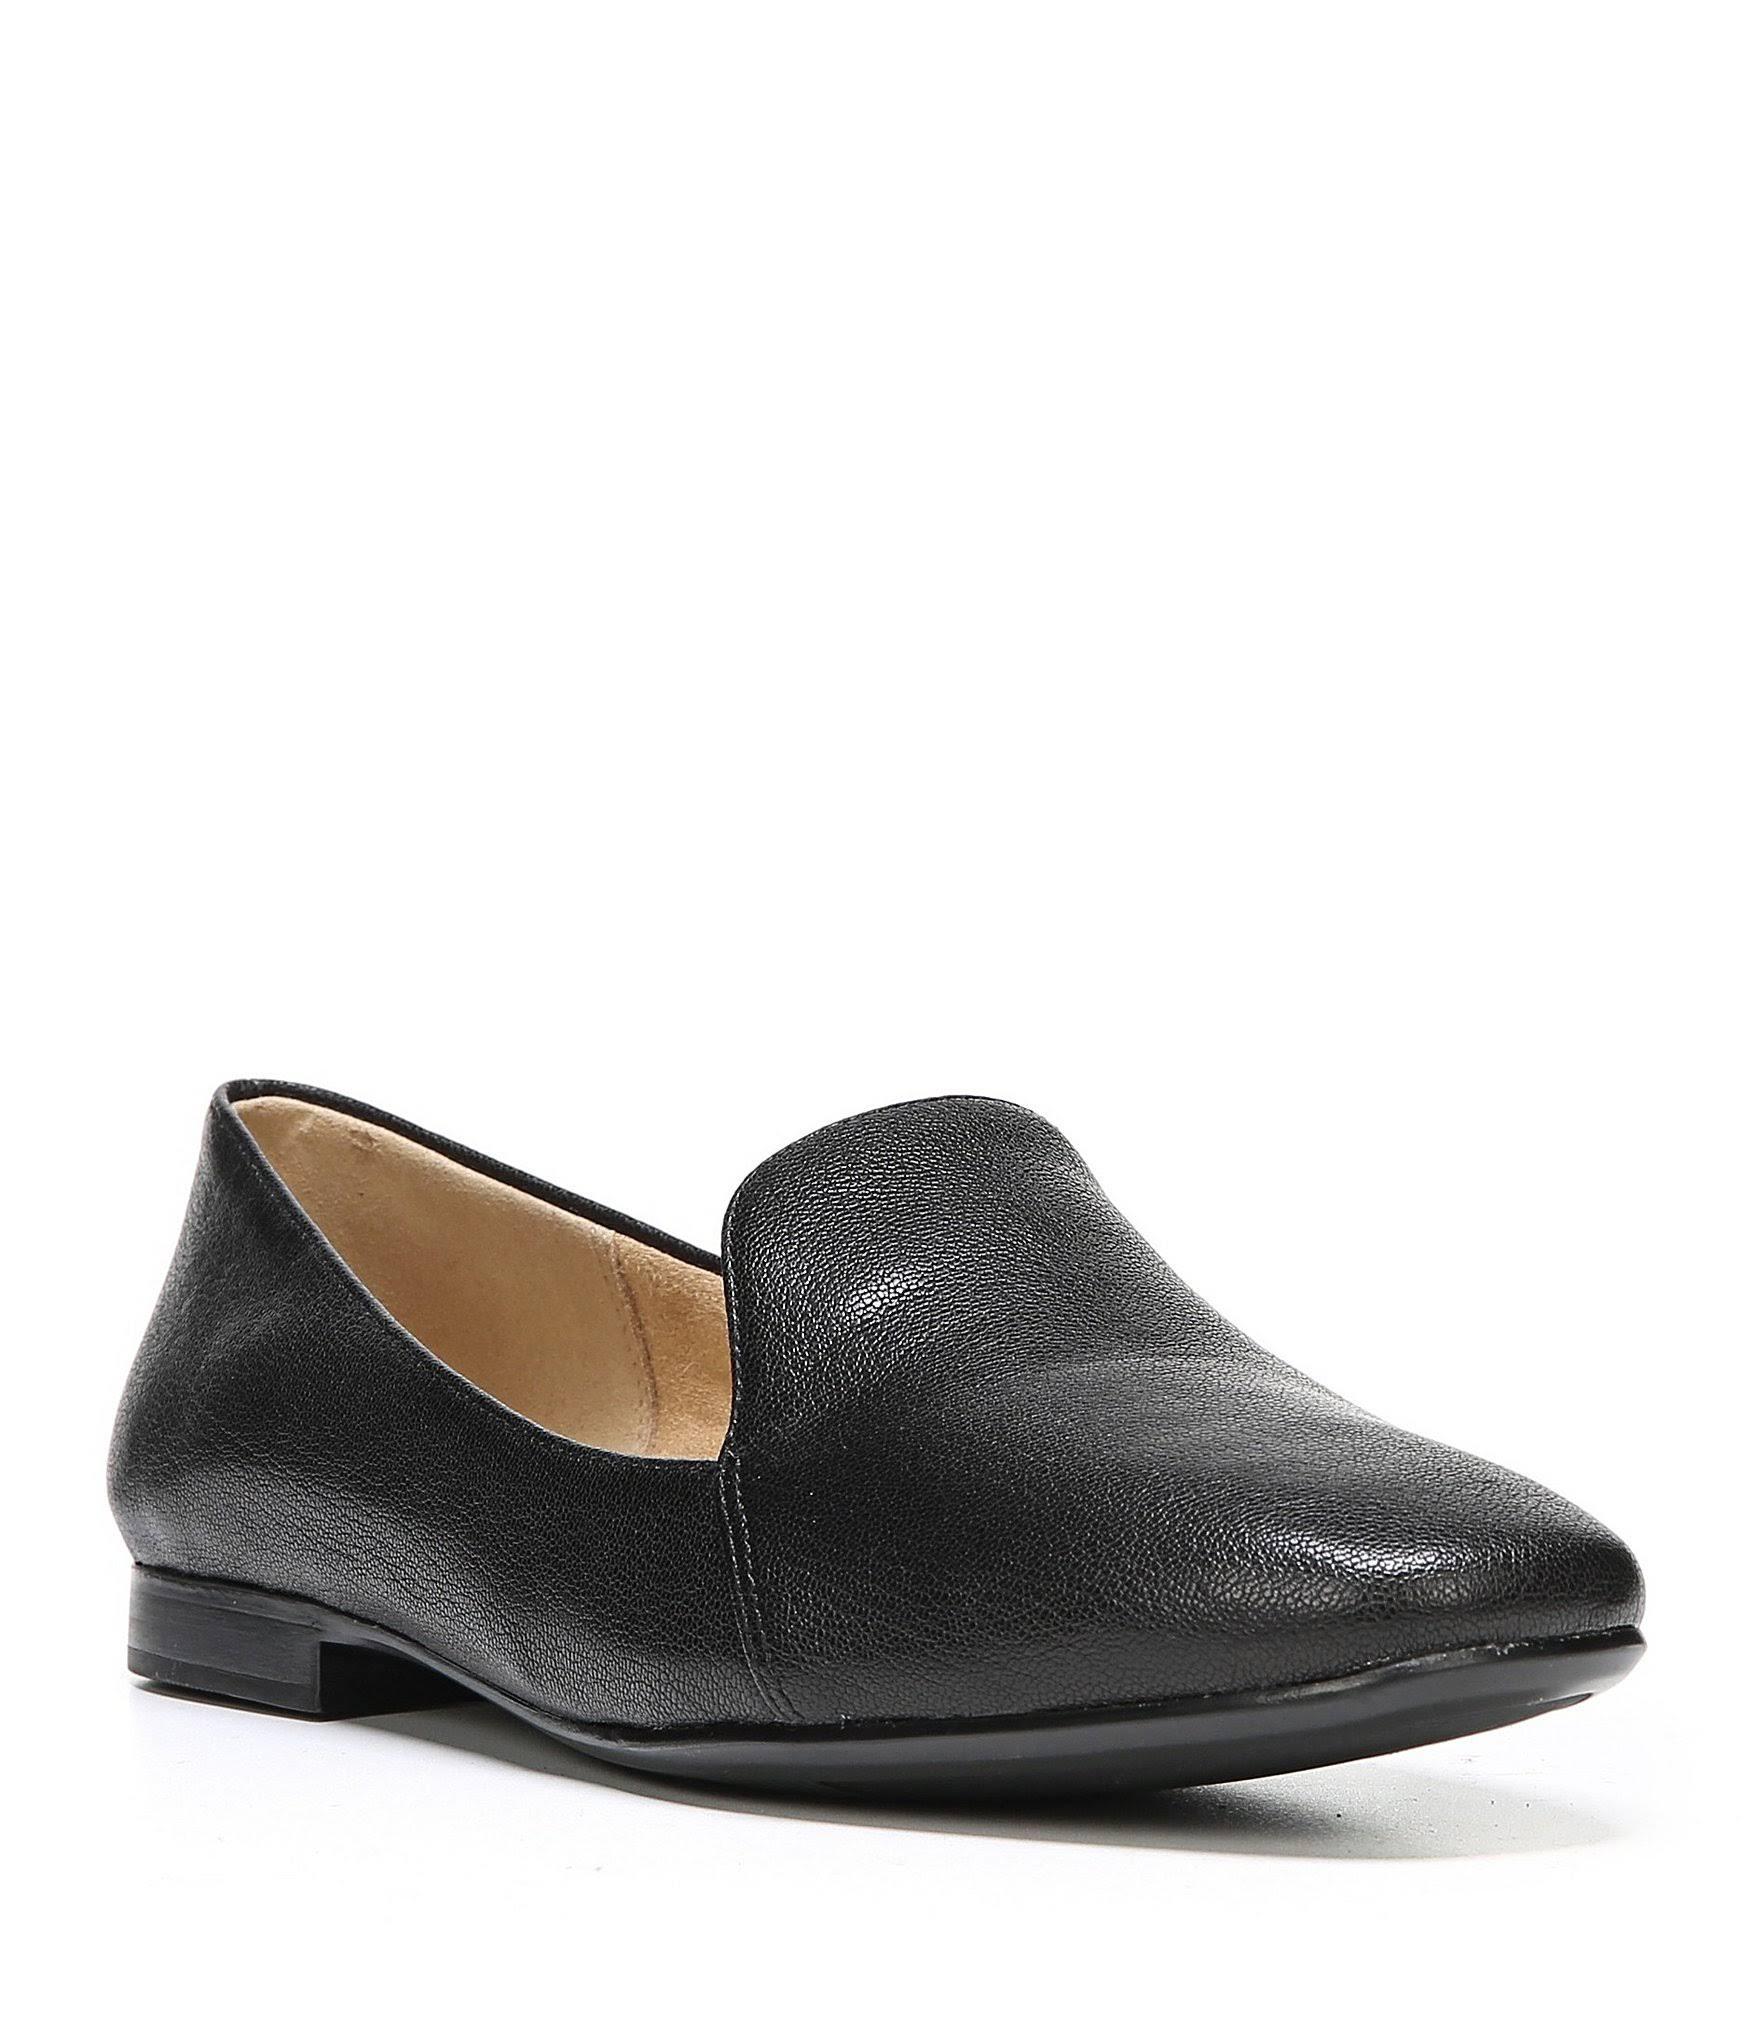 Black N 6 On Leather 5 Slip Naturalizer Tumble EmilineWomens uJcFTK3l1